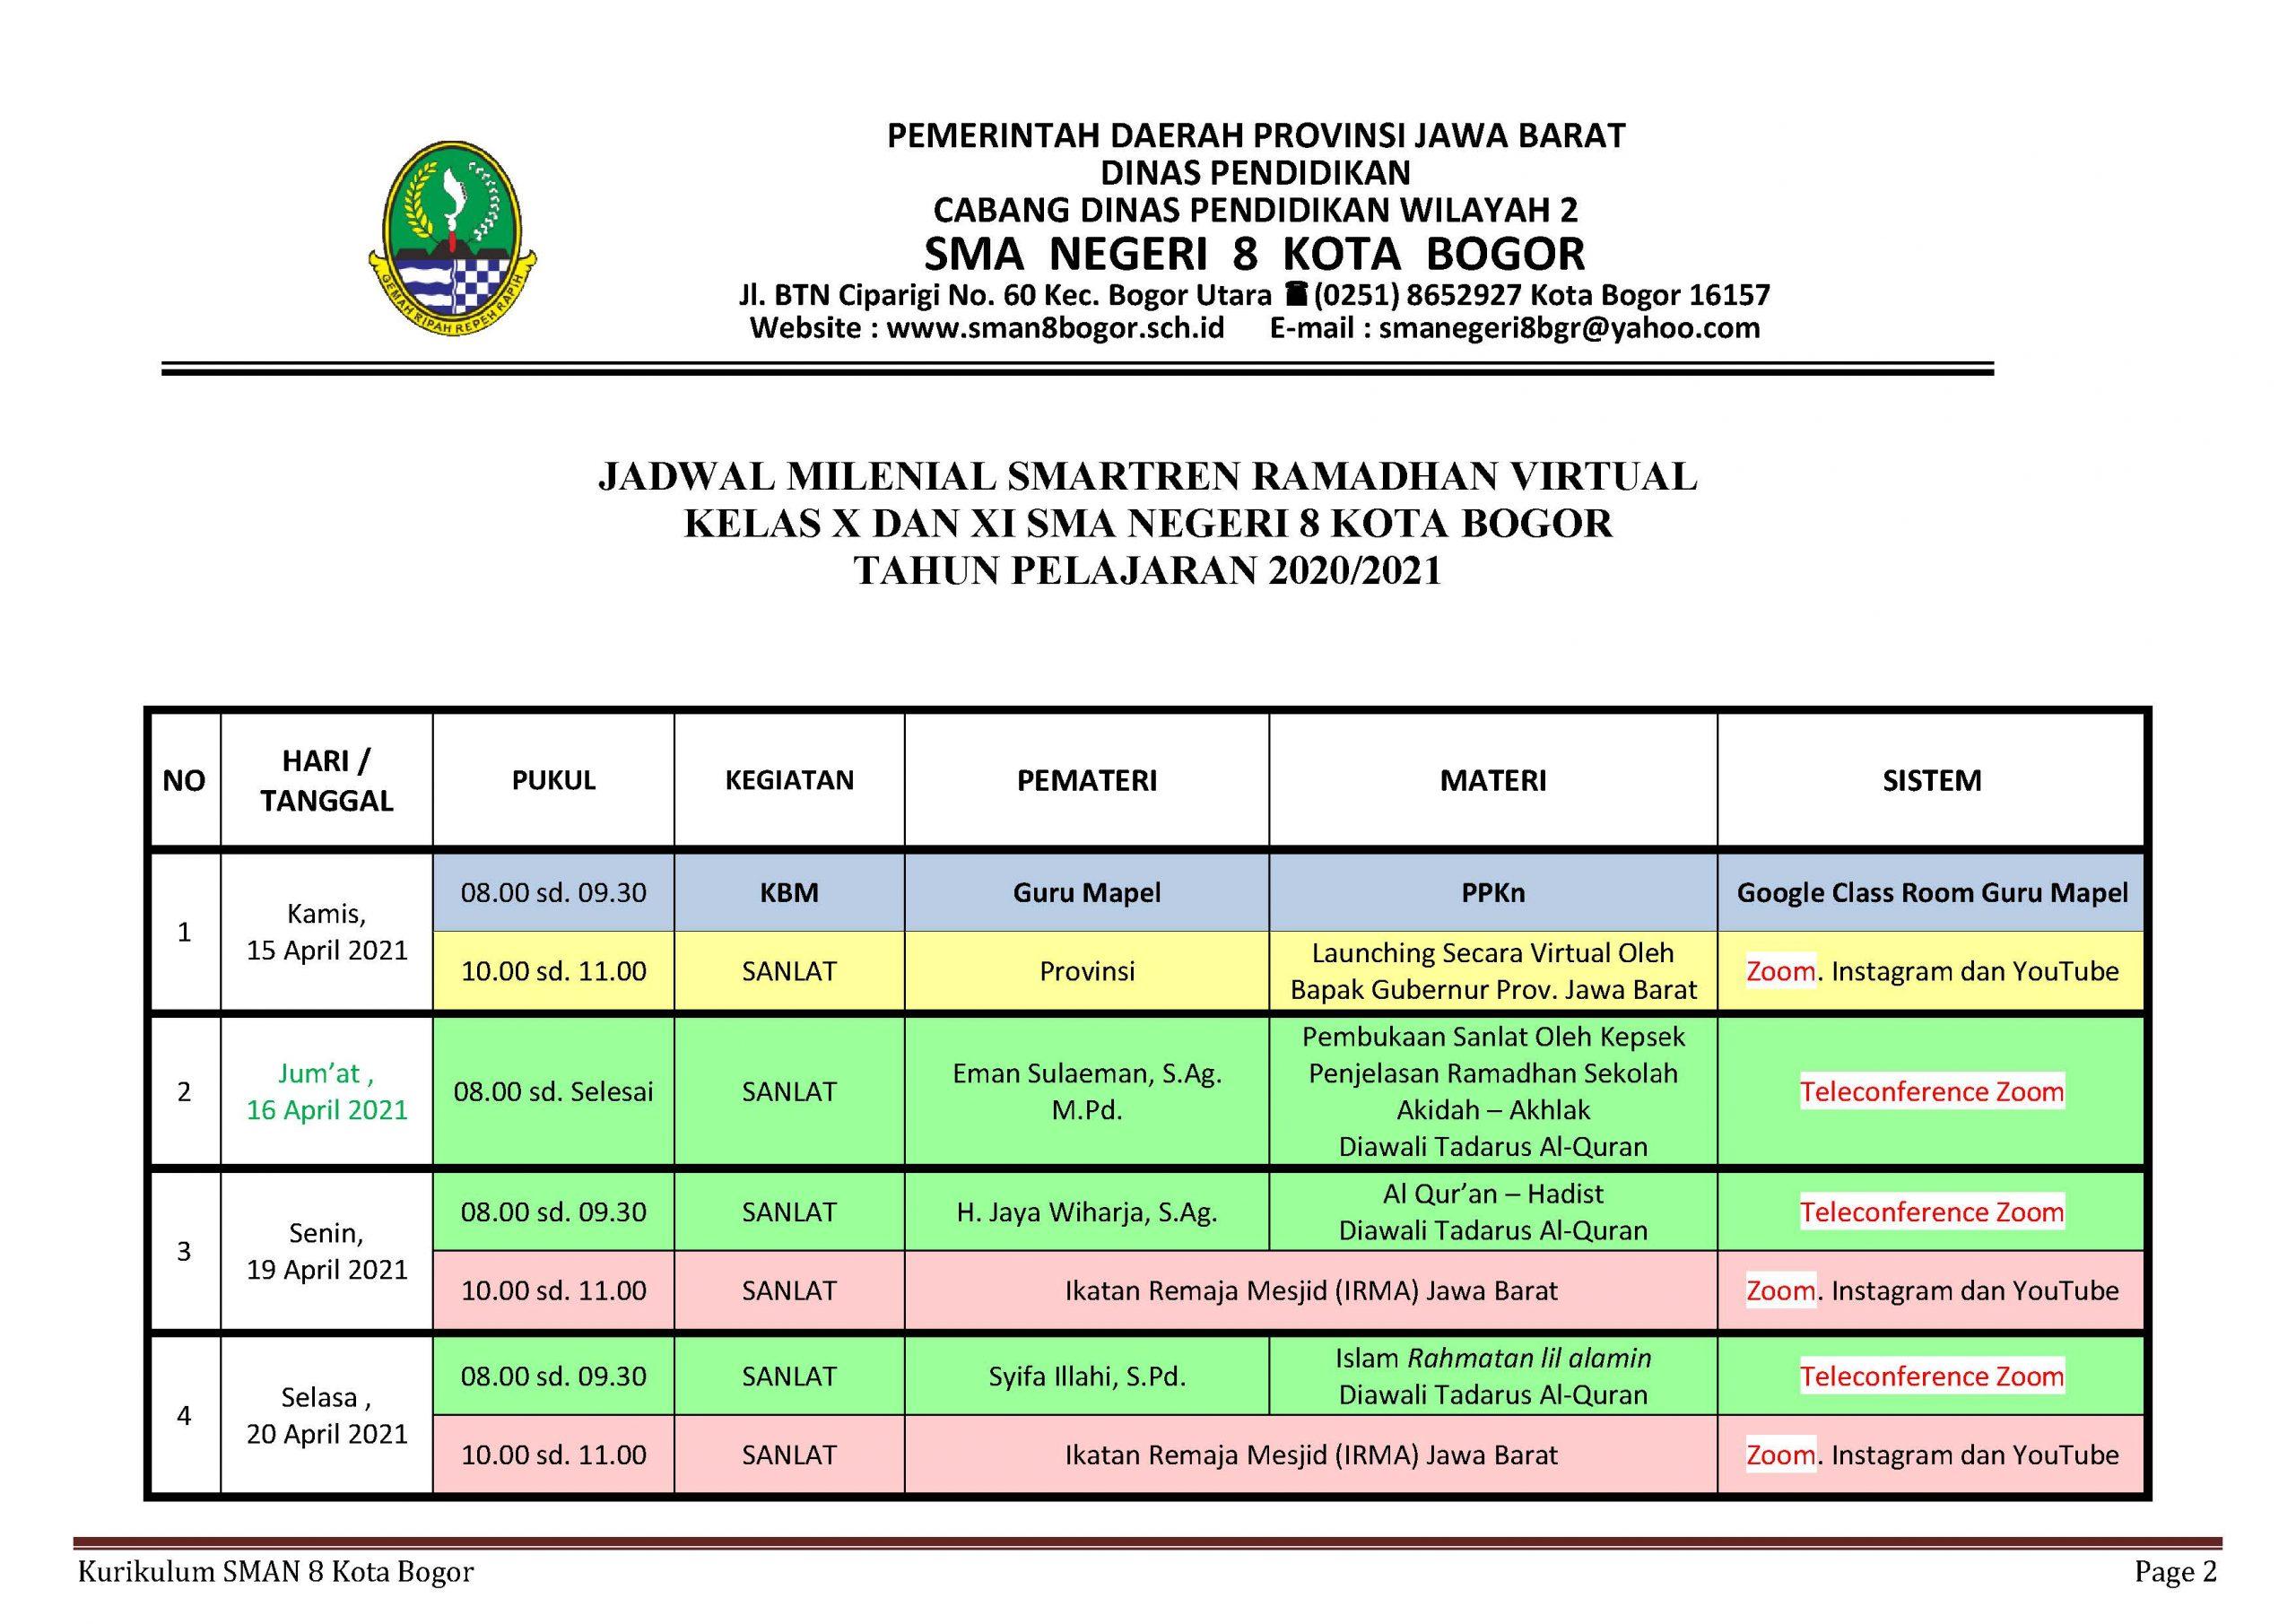 Jadwal KBM dan Sanlat 2021_Page_2